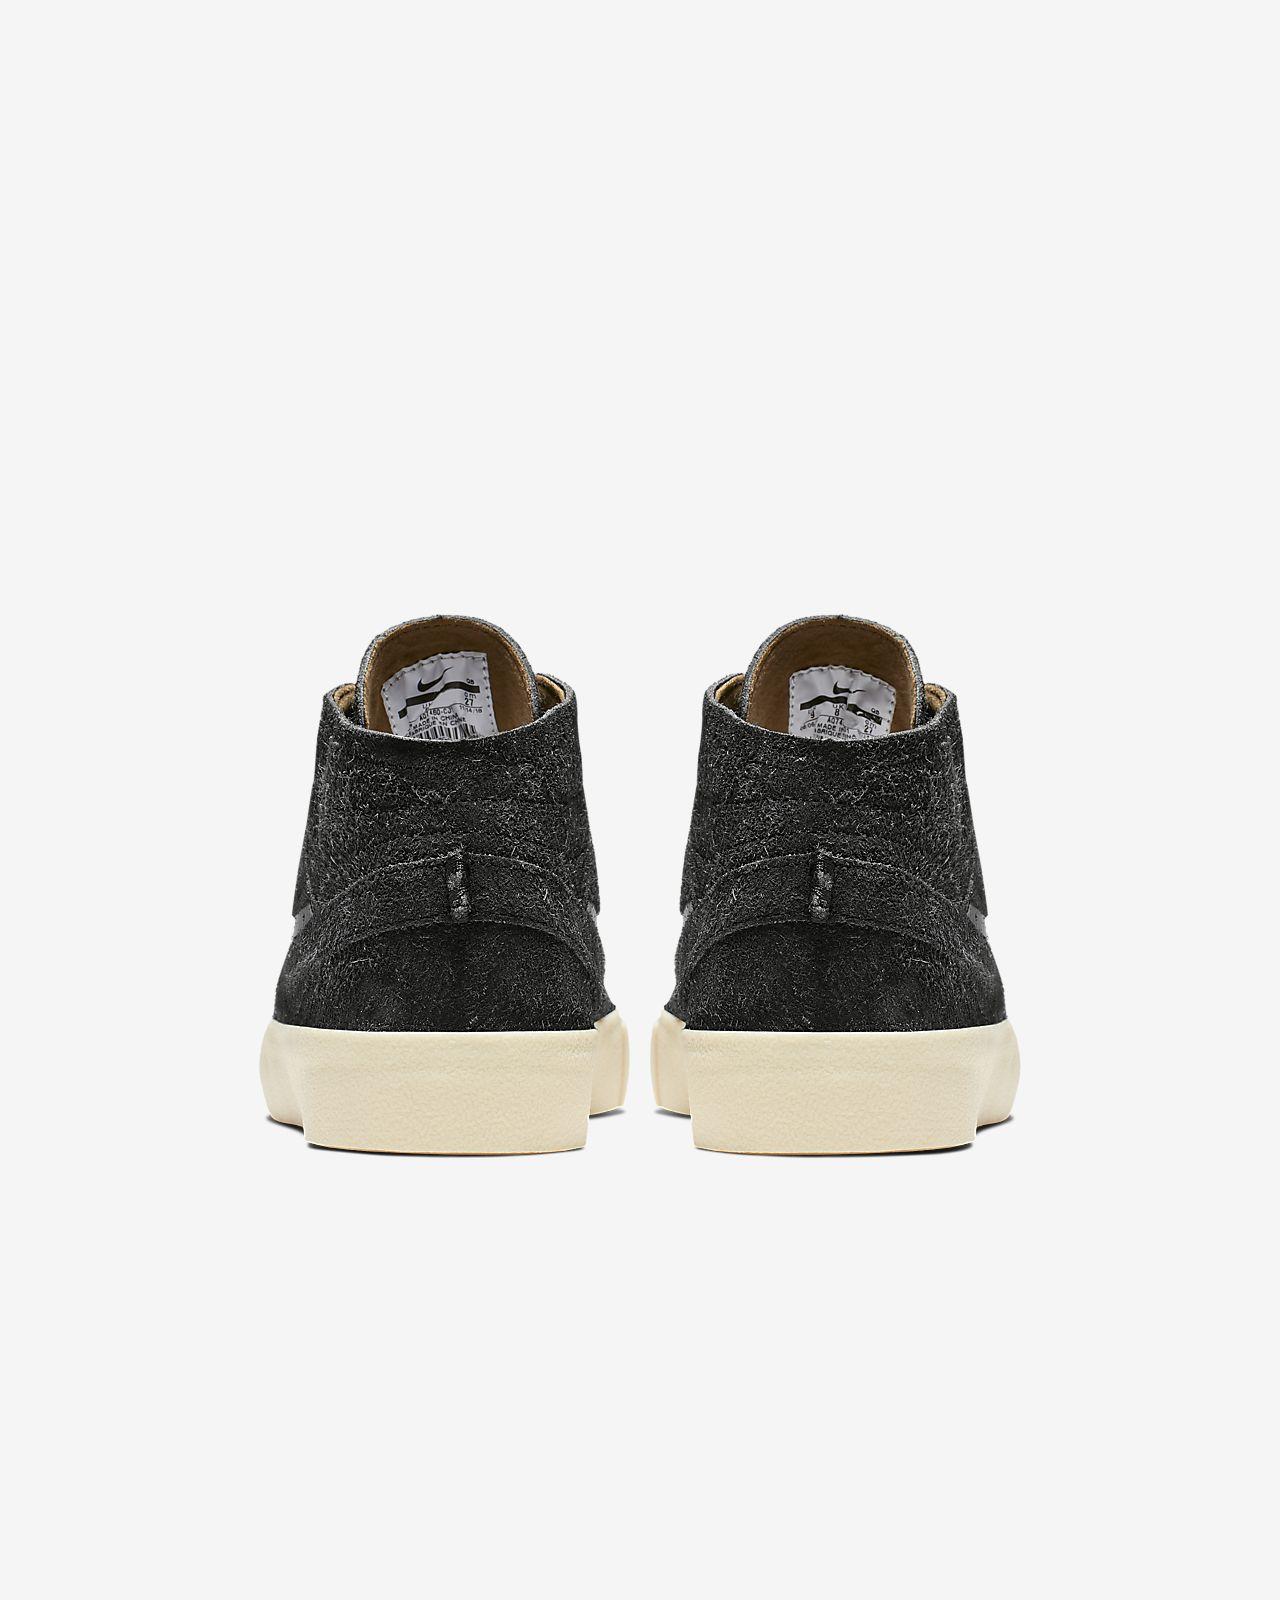 a322251cb804 Nike SB Zoom Janoski Mid Crafted Men s Skate Shoe. Nike.com GB